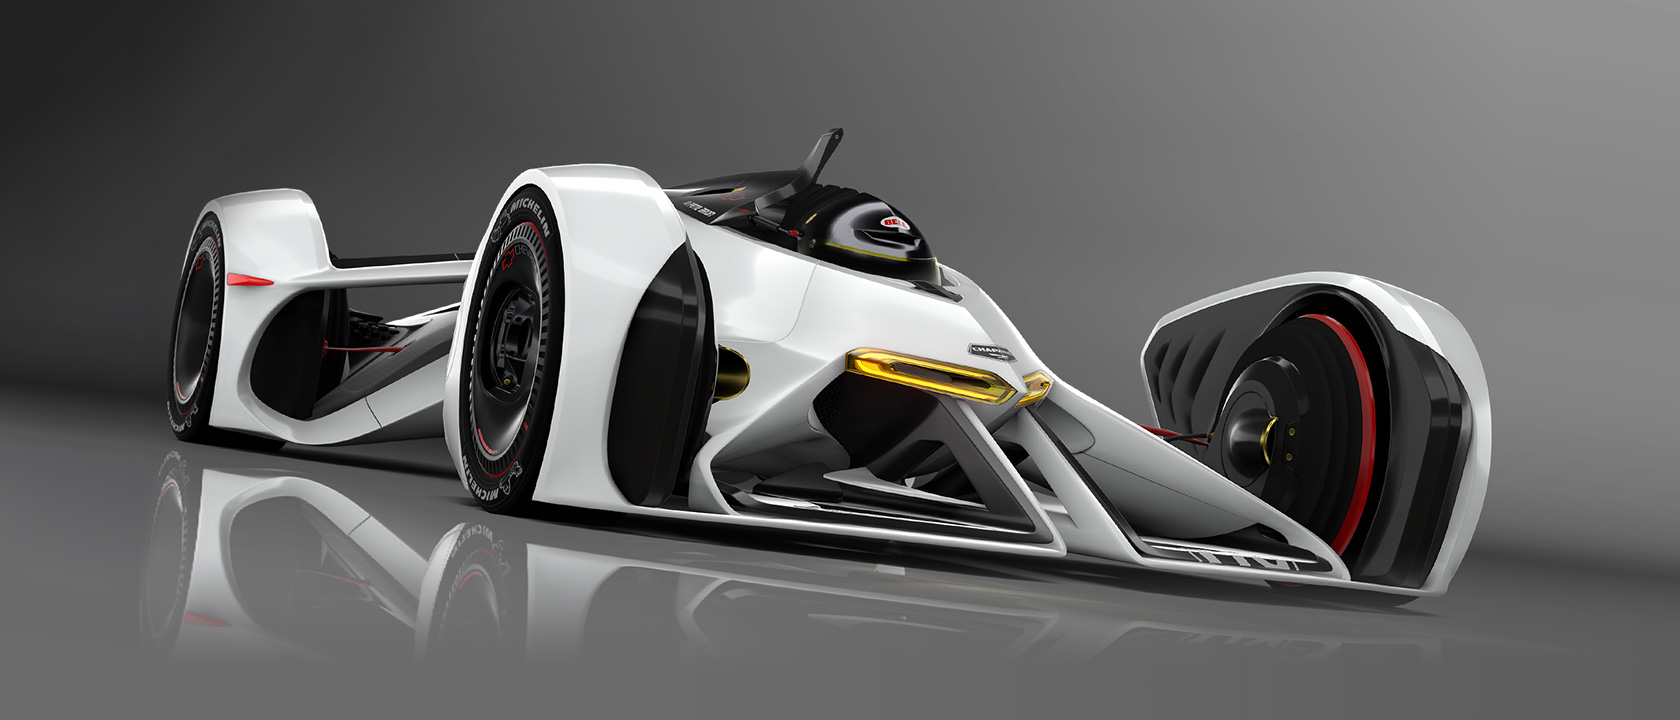 Formula One Car Wallpaper Chevrolet Chaparral 2x Vision Gran Turismo Gran Turismo Com